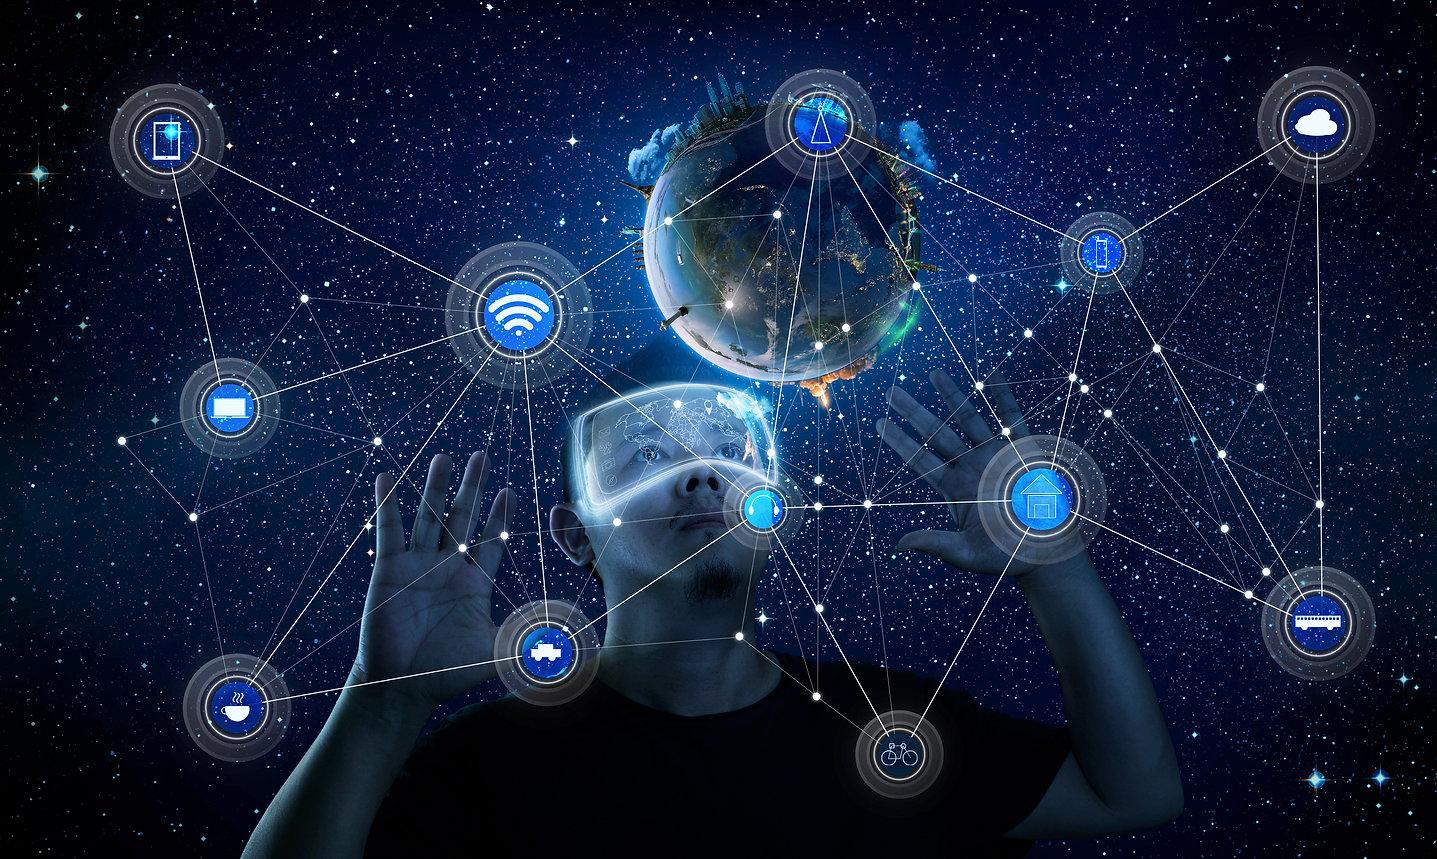 graphicstock-smart-city-and-wireless-com